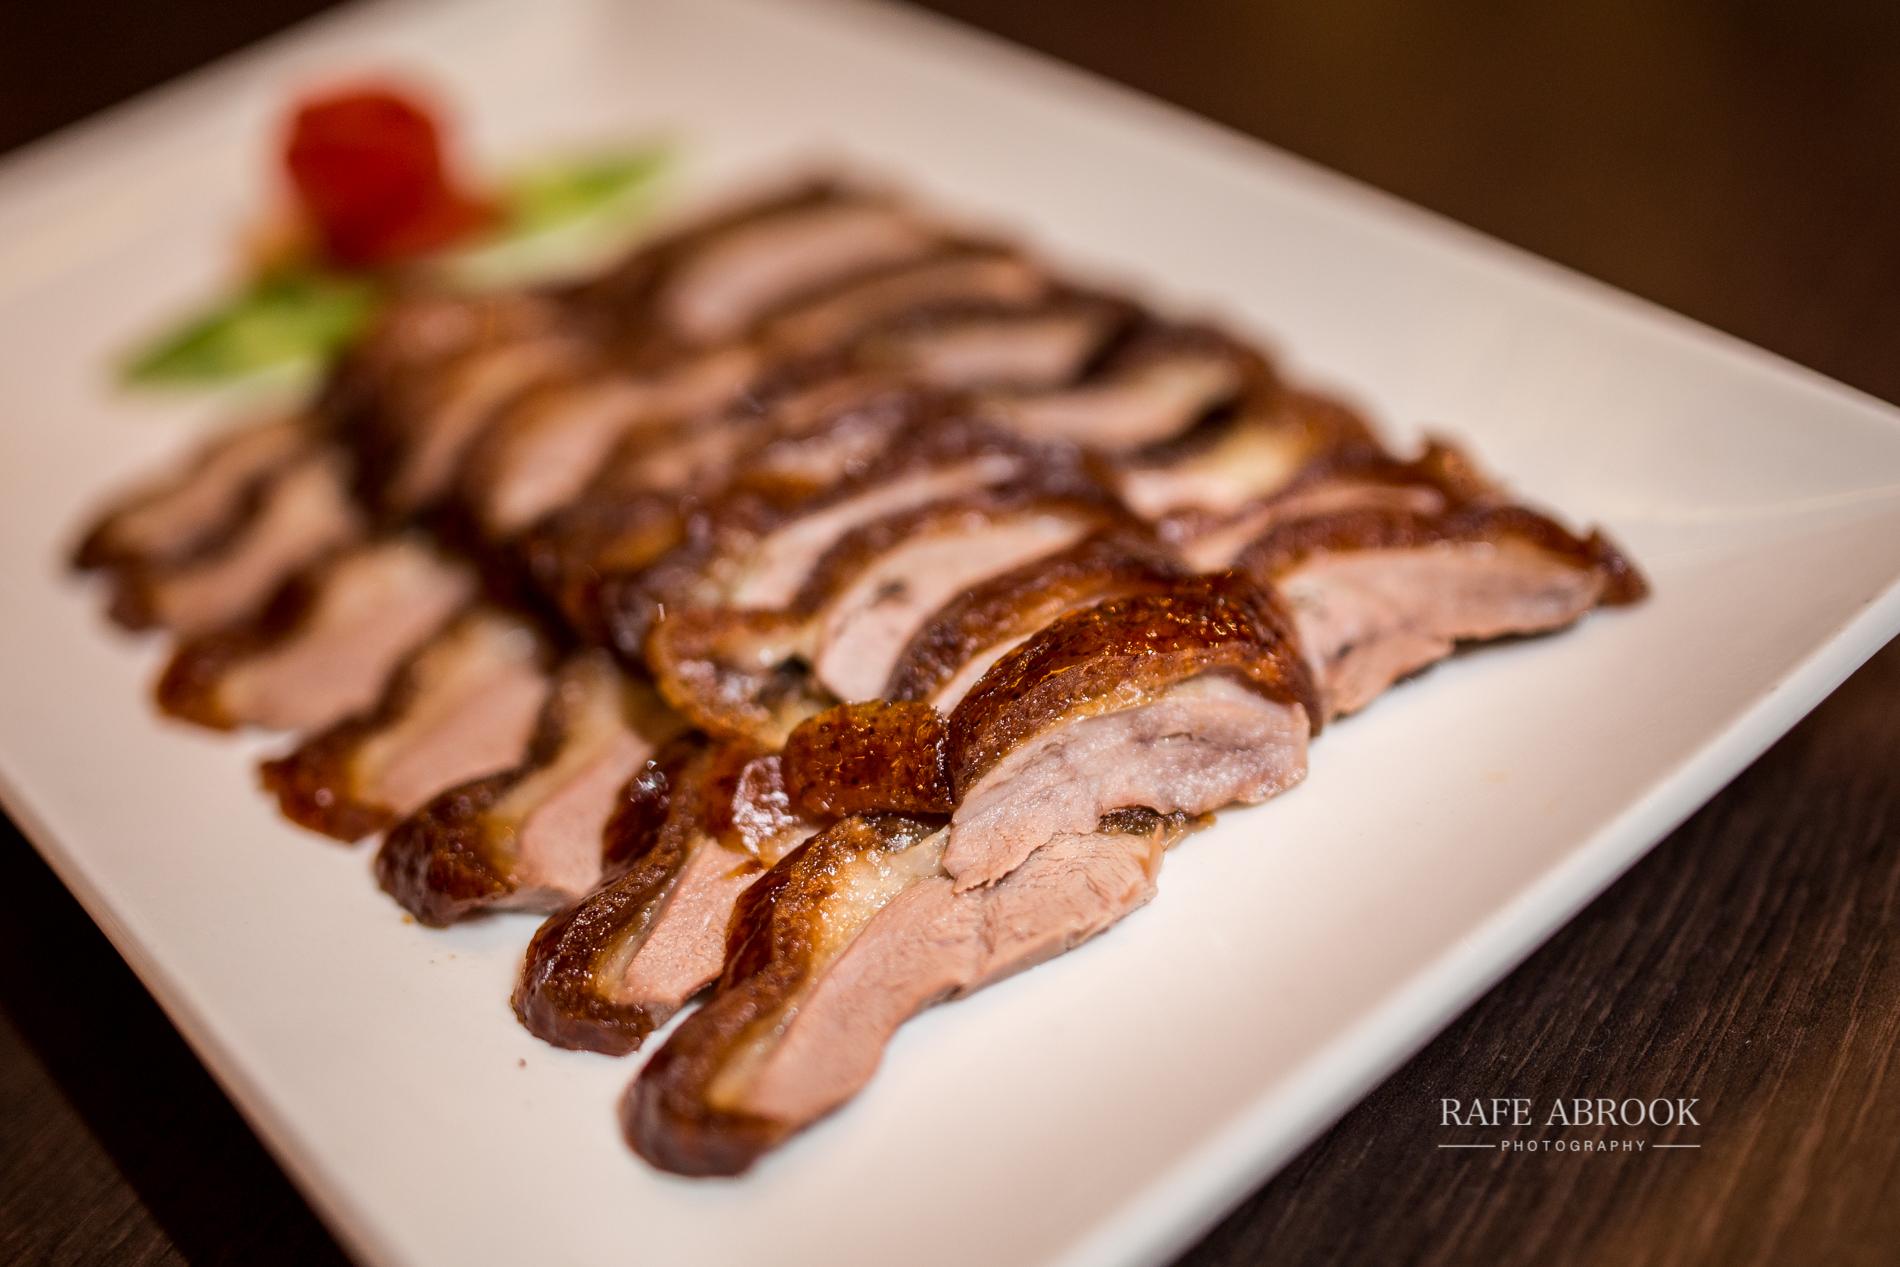 min jiang food blogger rafe abrook photography training-1005.jpg